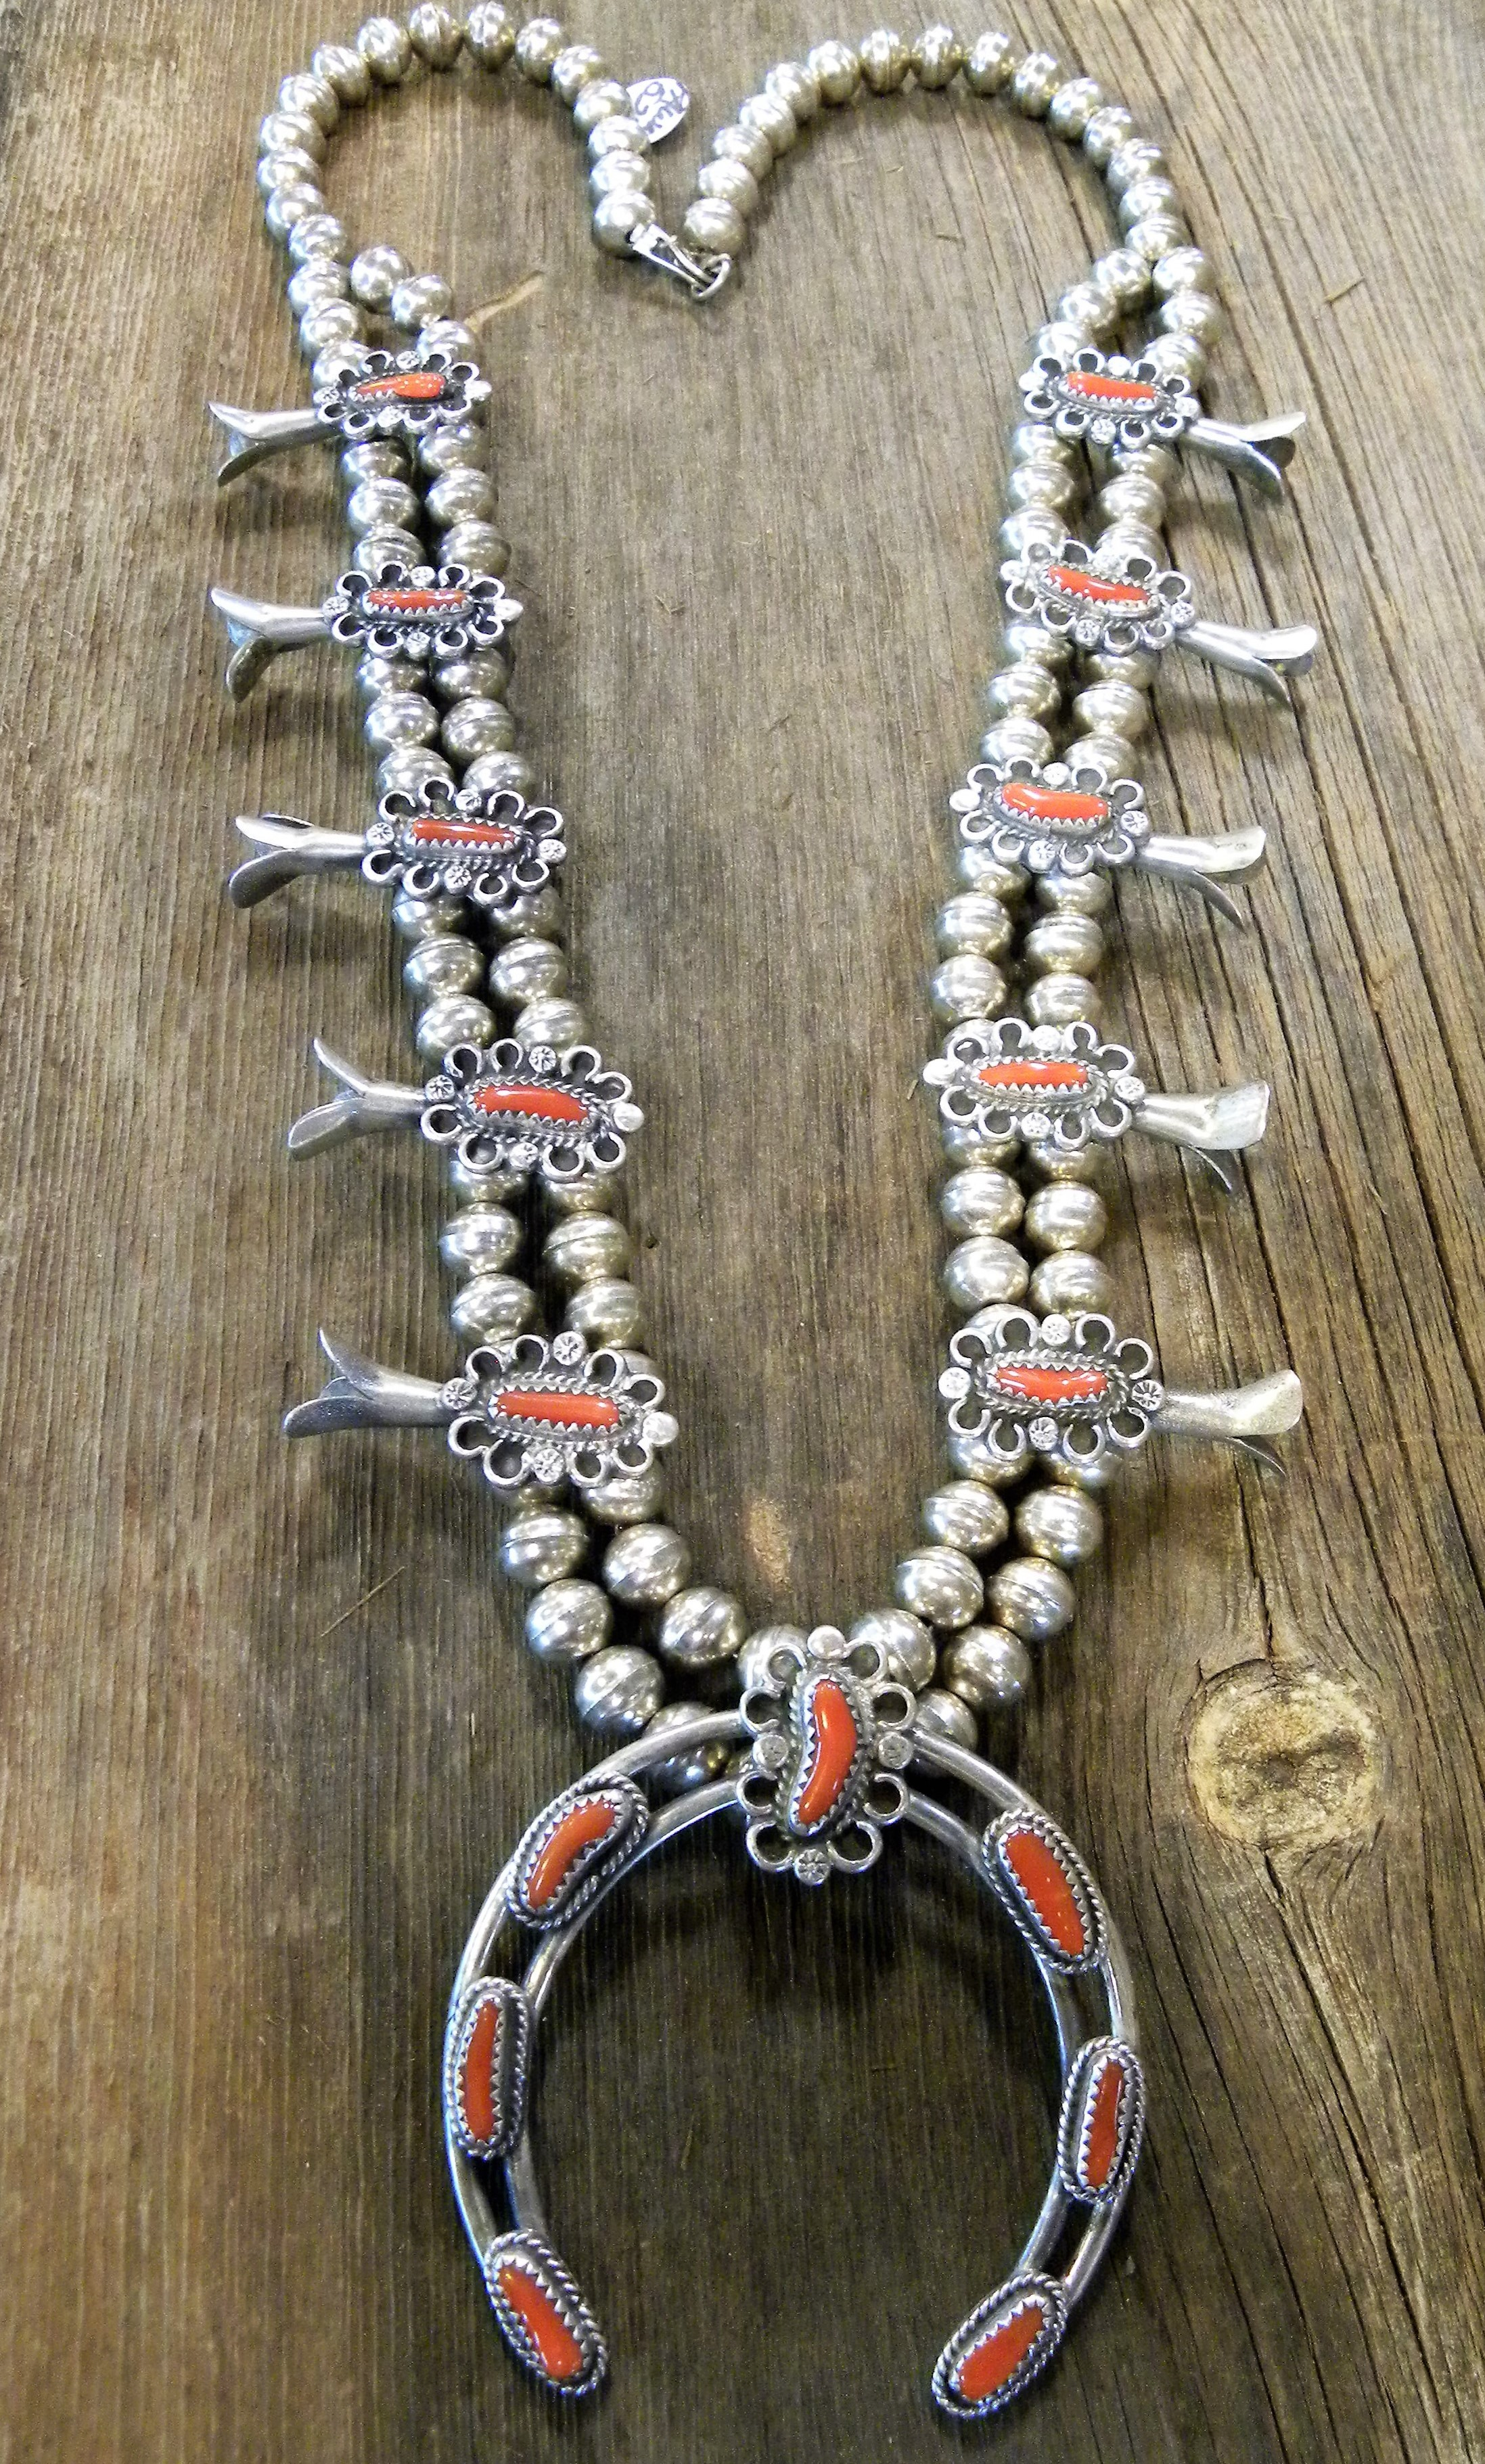 SBN6 Pawn Navajo Handmade Coral Squash Blossom Necklace